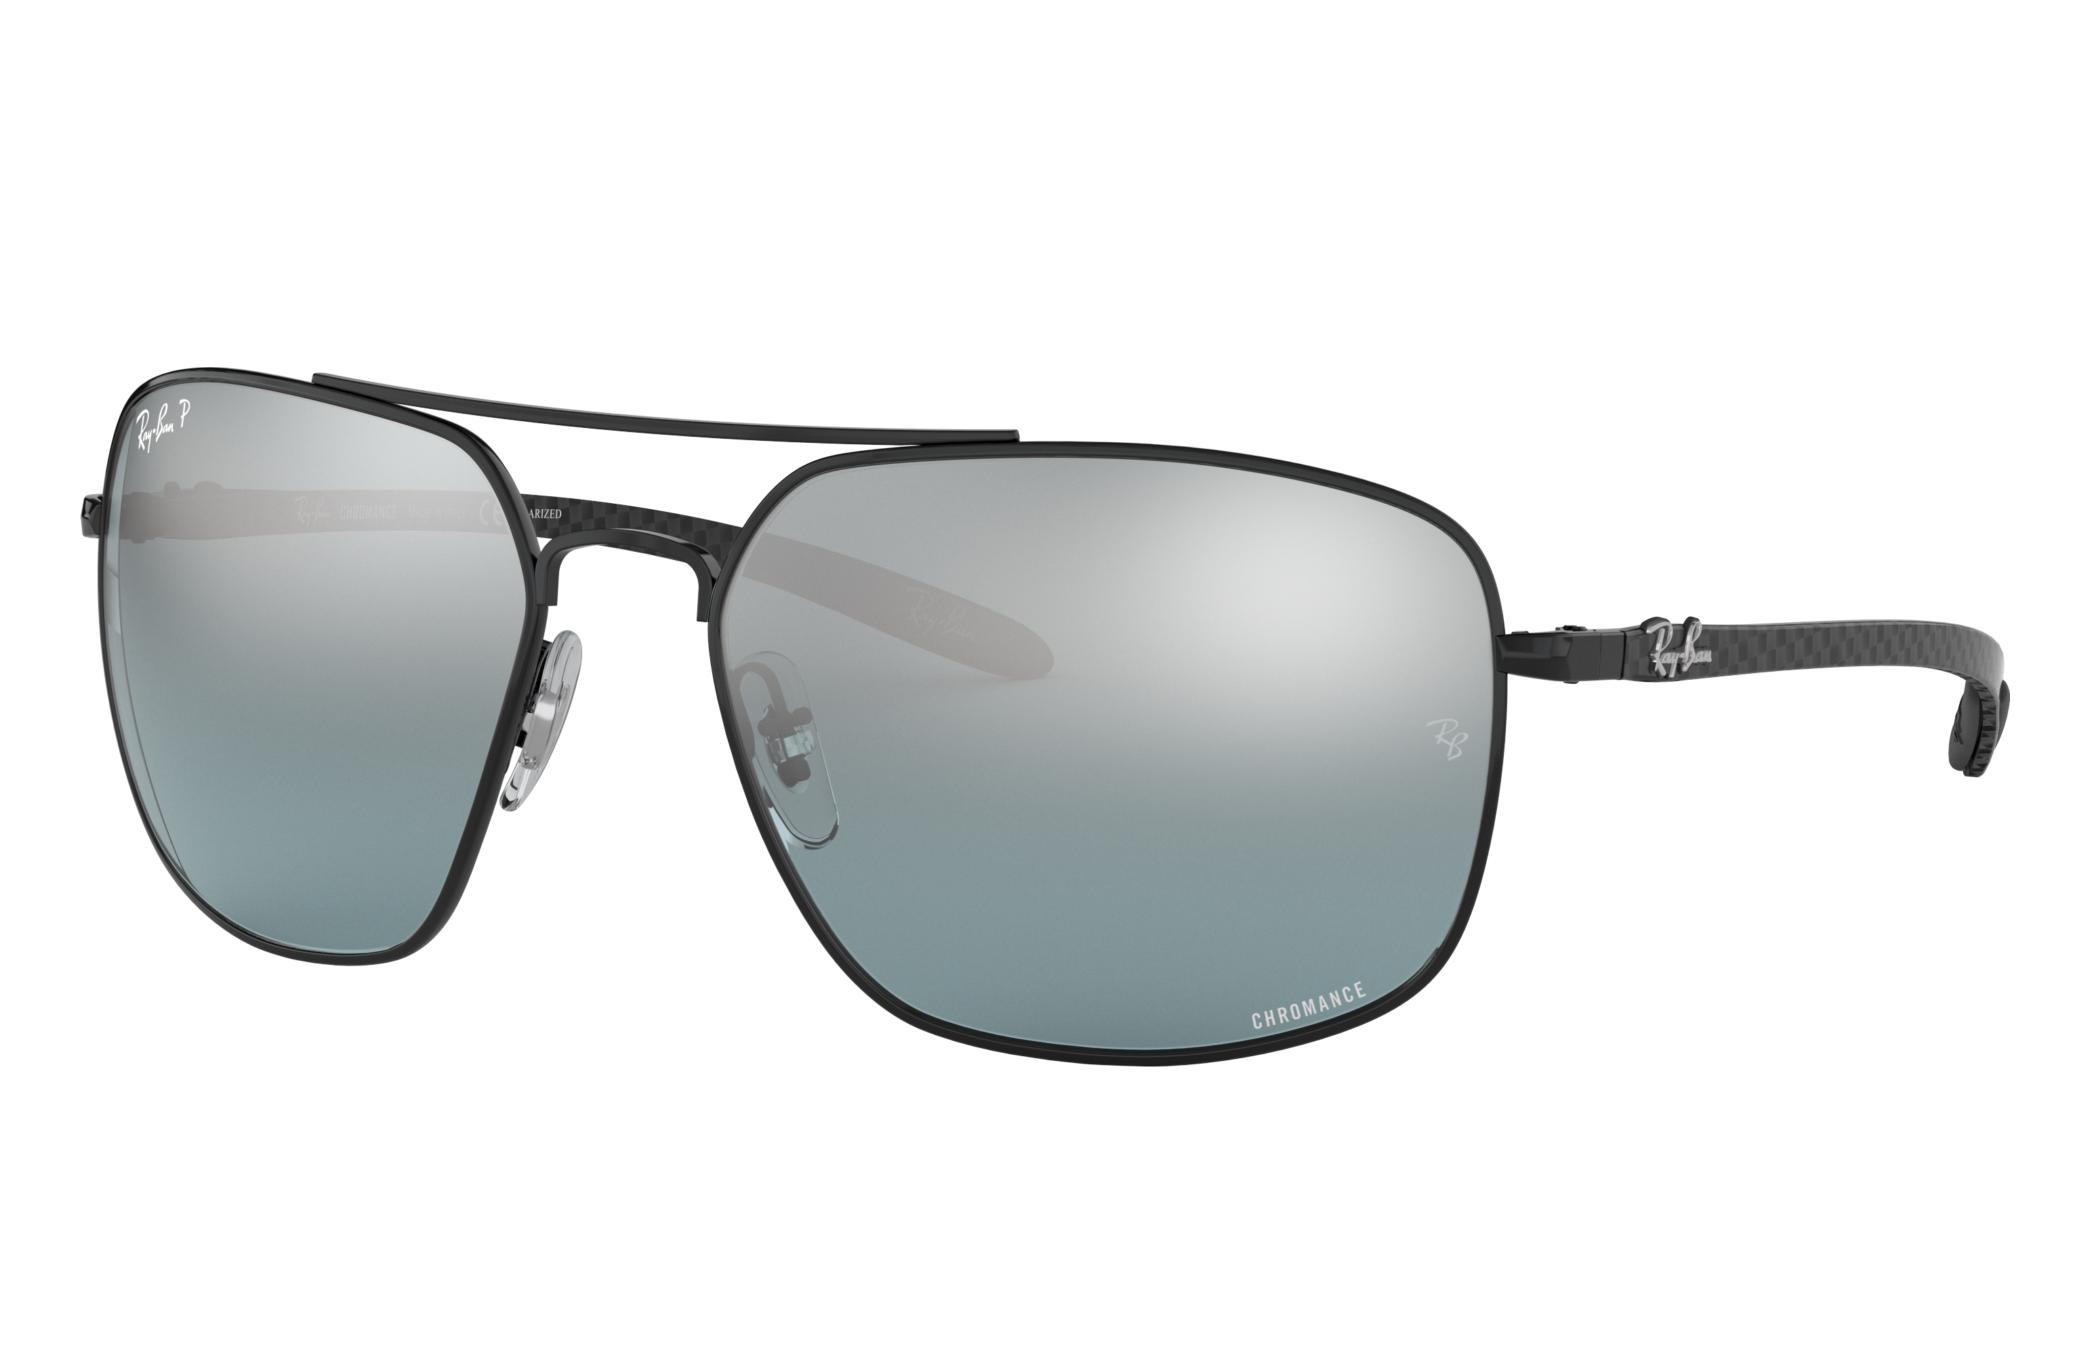 Ray-Ban Rb8322 Chromance Black, Polarized Gray Lenses - RB8322CH